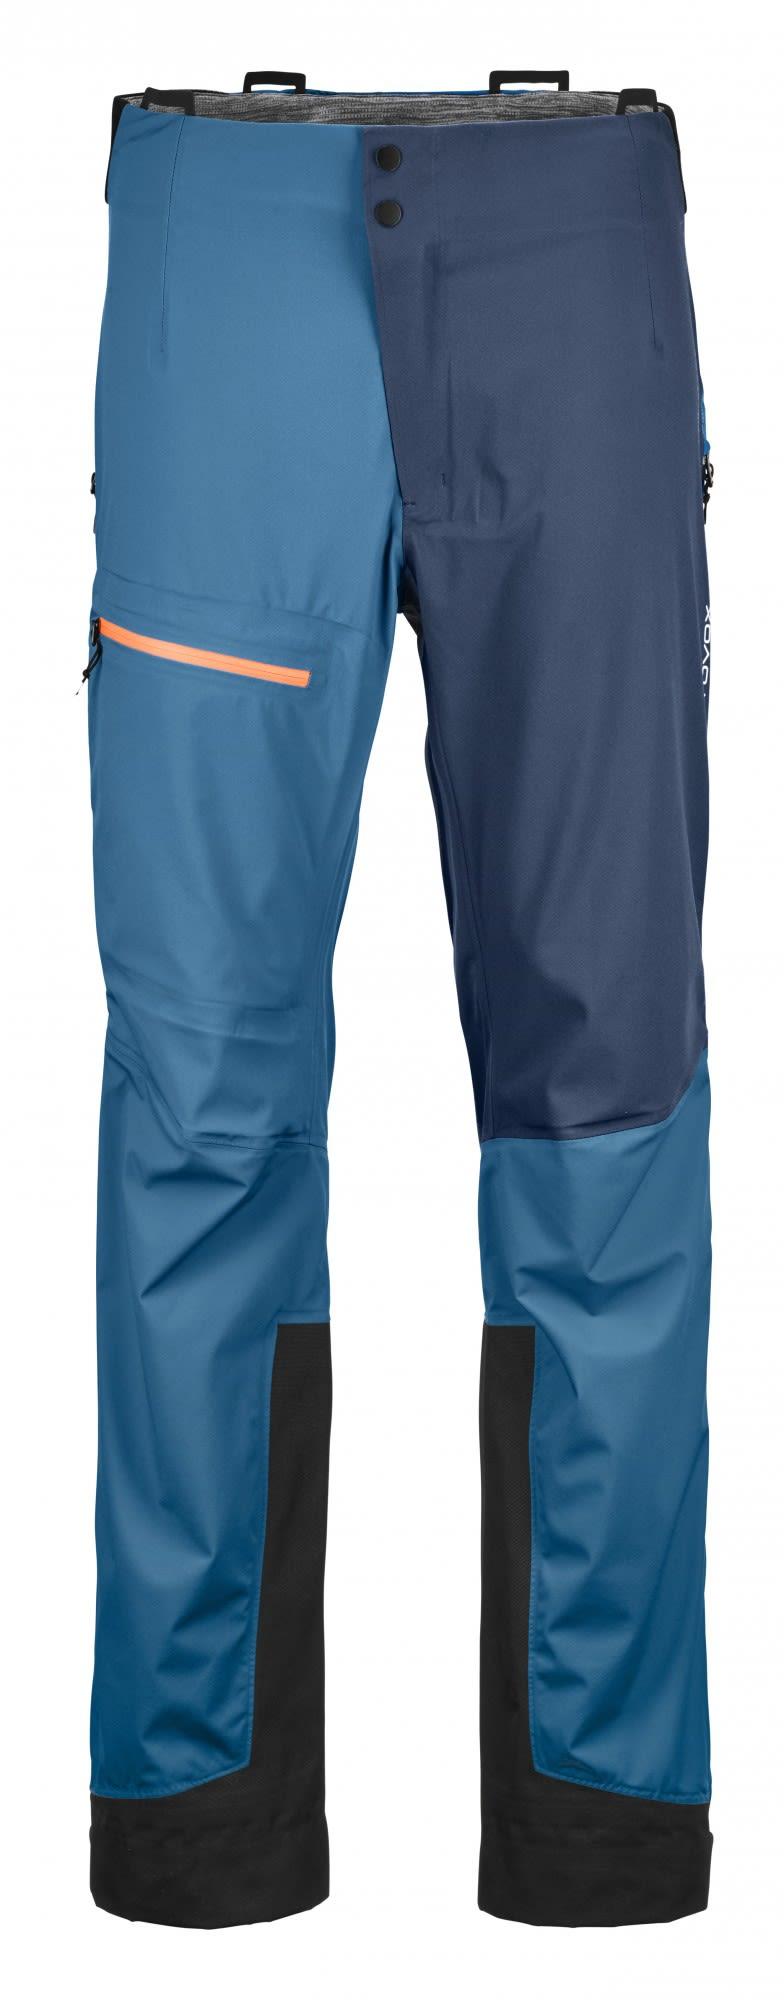 Ortovox Merino Naked Sheep 3L Ortler Pants Blau, Male Dermizax™ Hose, XL